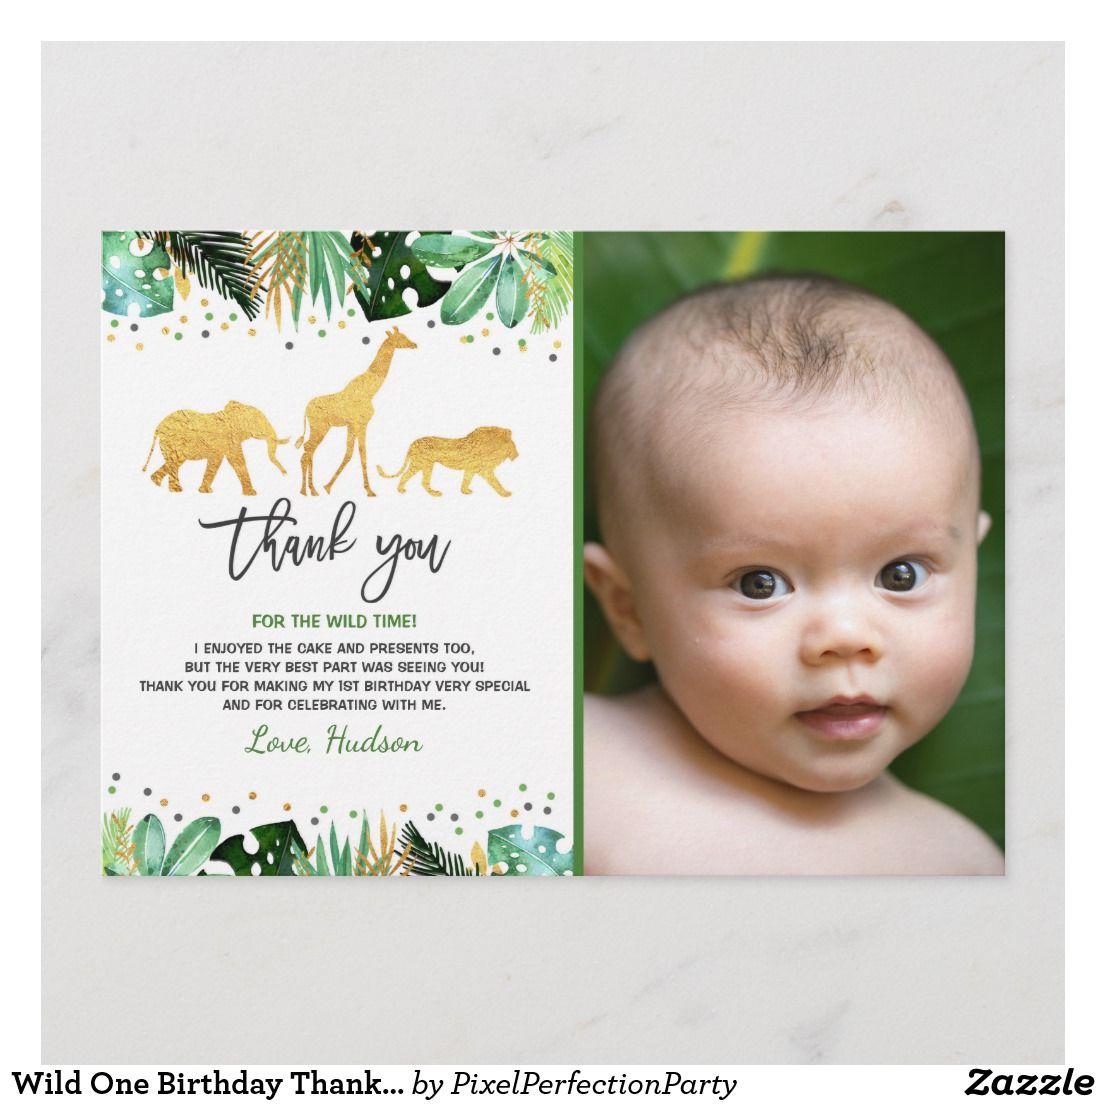 Wild One Birthday Thank You Card Jungle Animals Zazzle Com Birthday Thank You Cards Birthday Thank You Jungle Theme Birthday